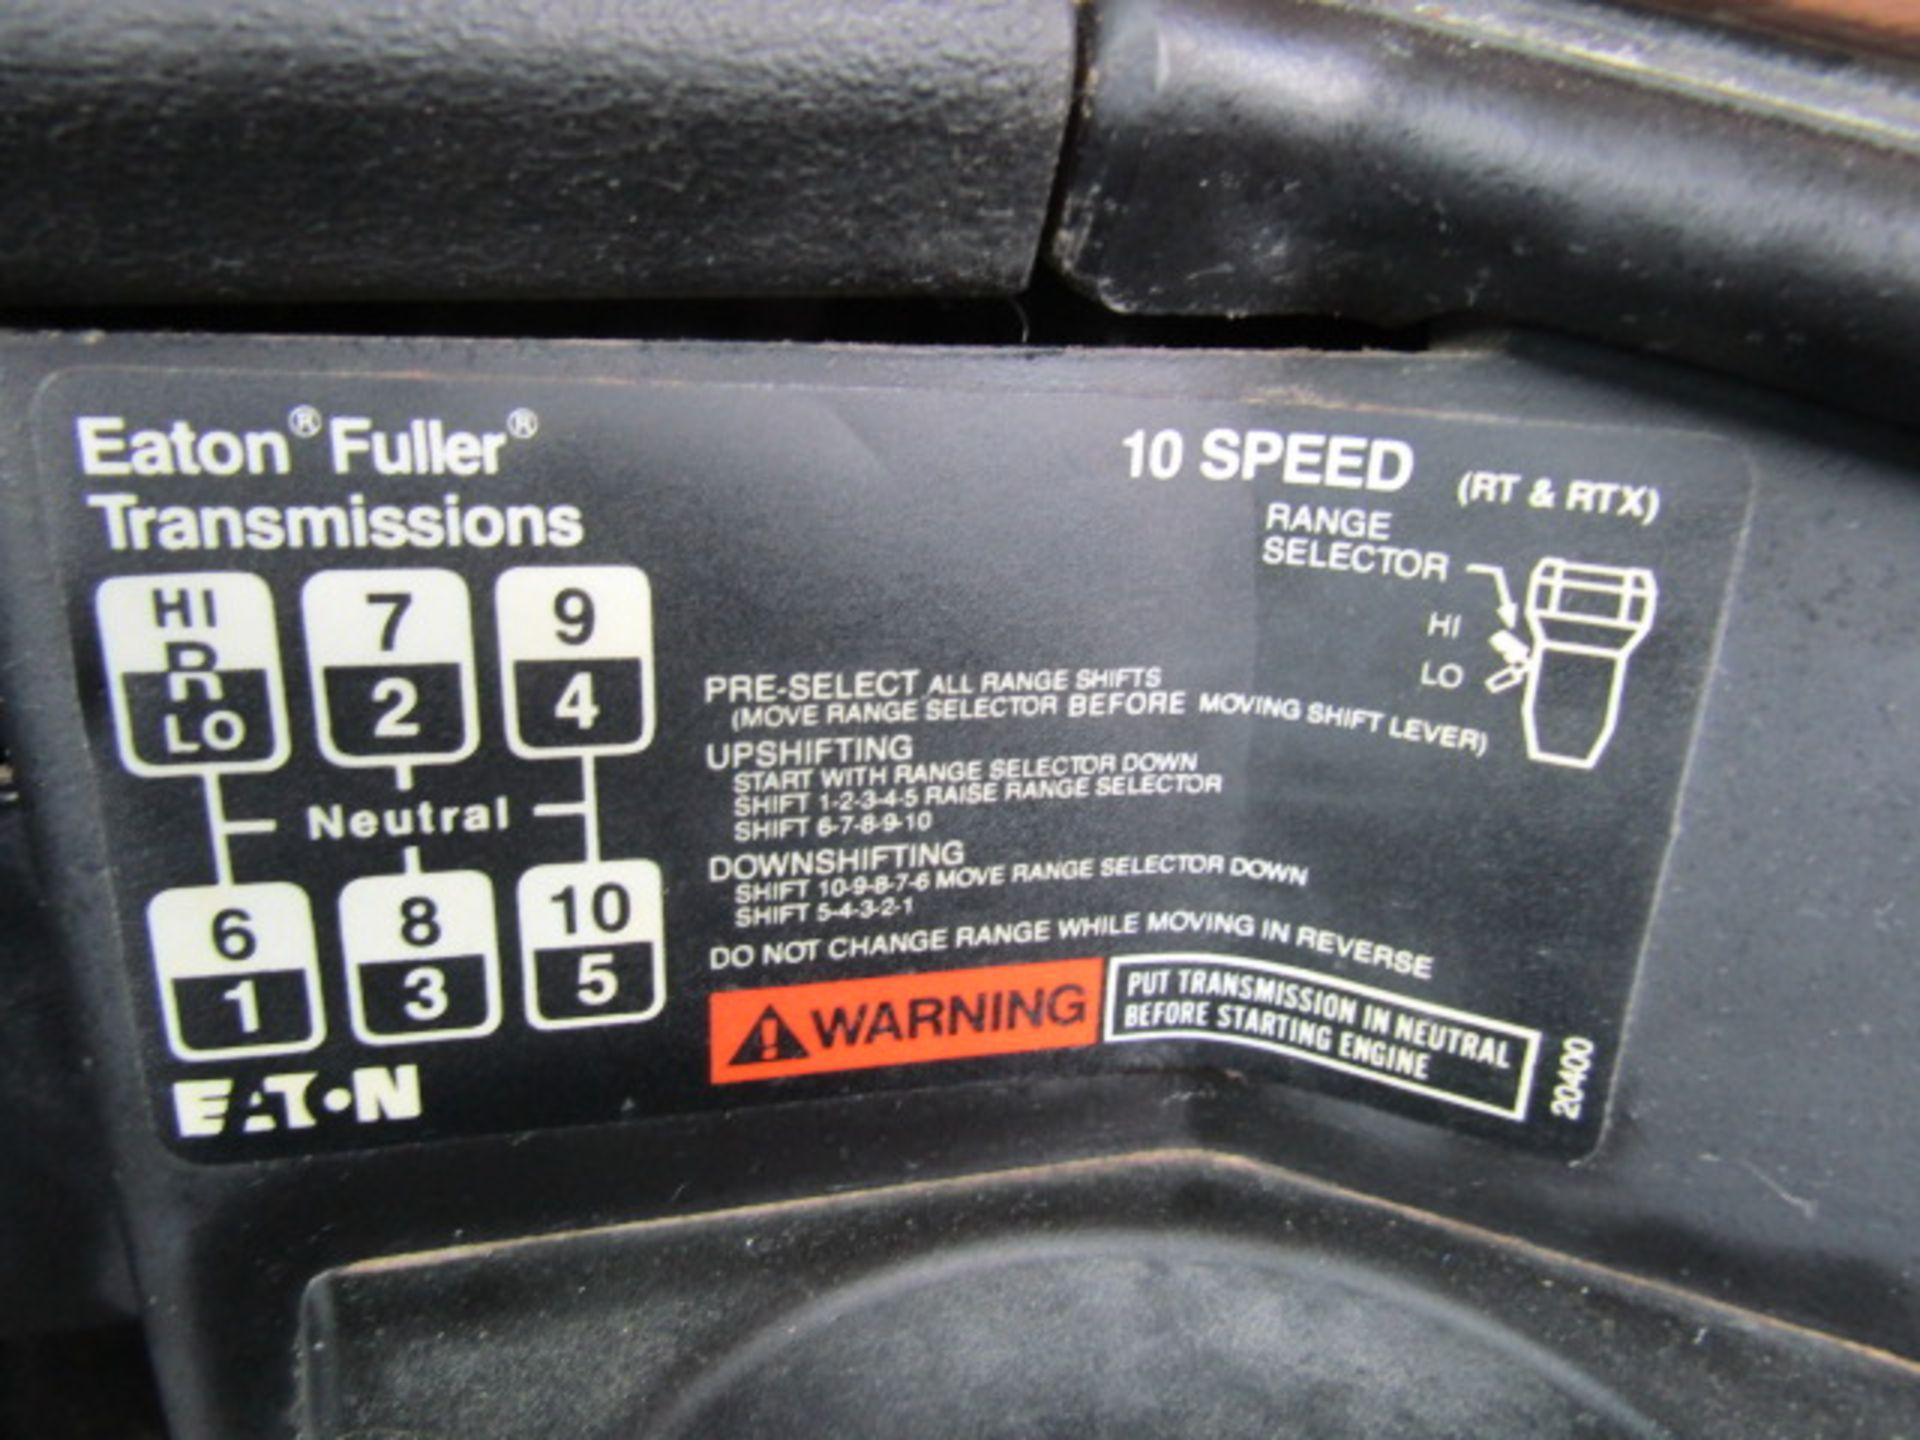 Lot 210 - 1994 Freightliner, VIN #1FUW3LYA0RH605546, 71,282 Miles, 10 Speed Eaton Fuller Manual